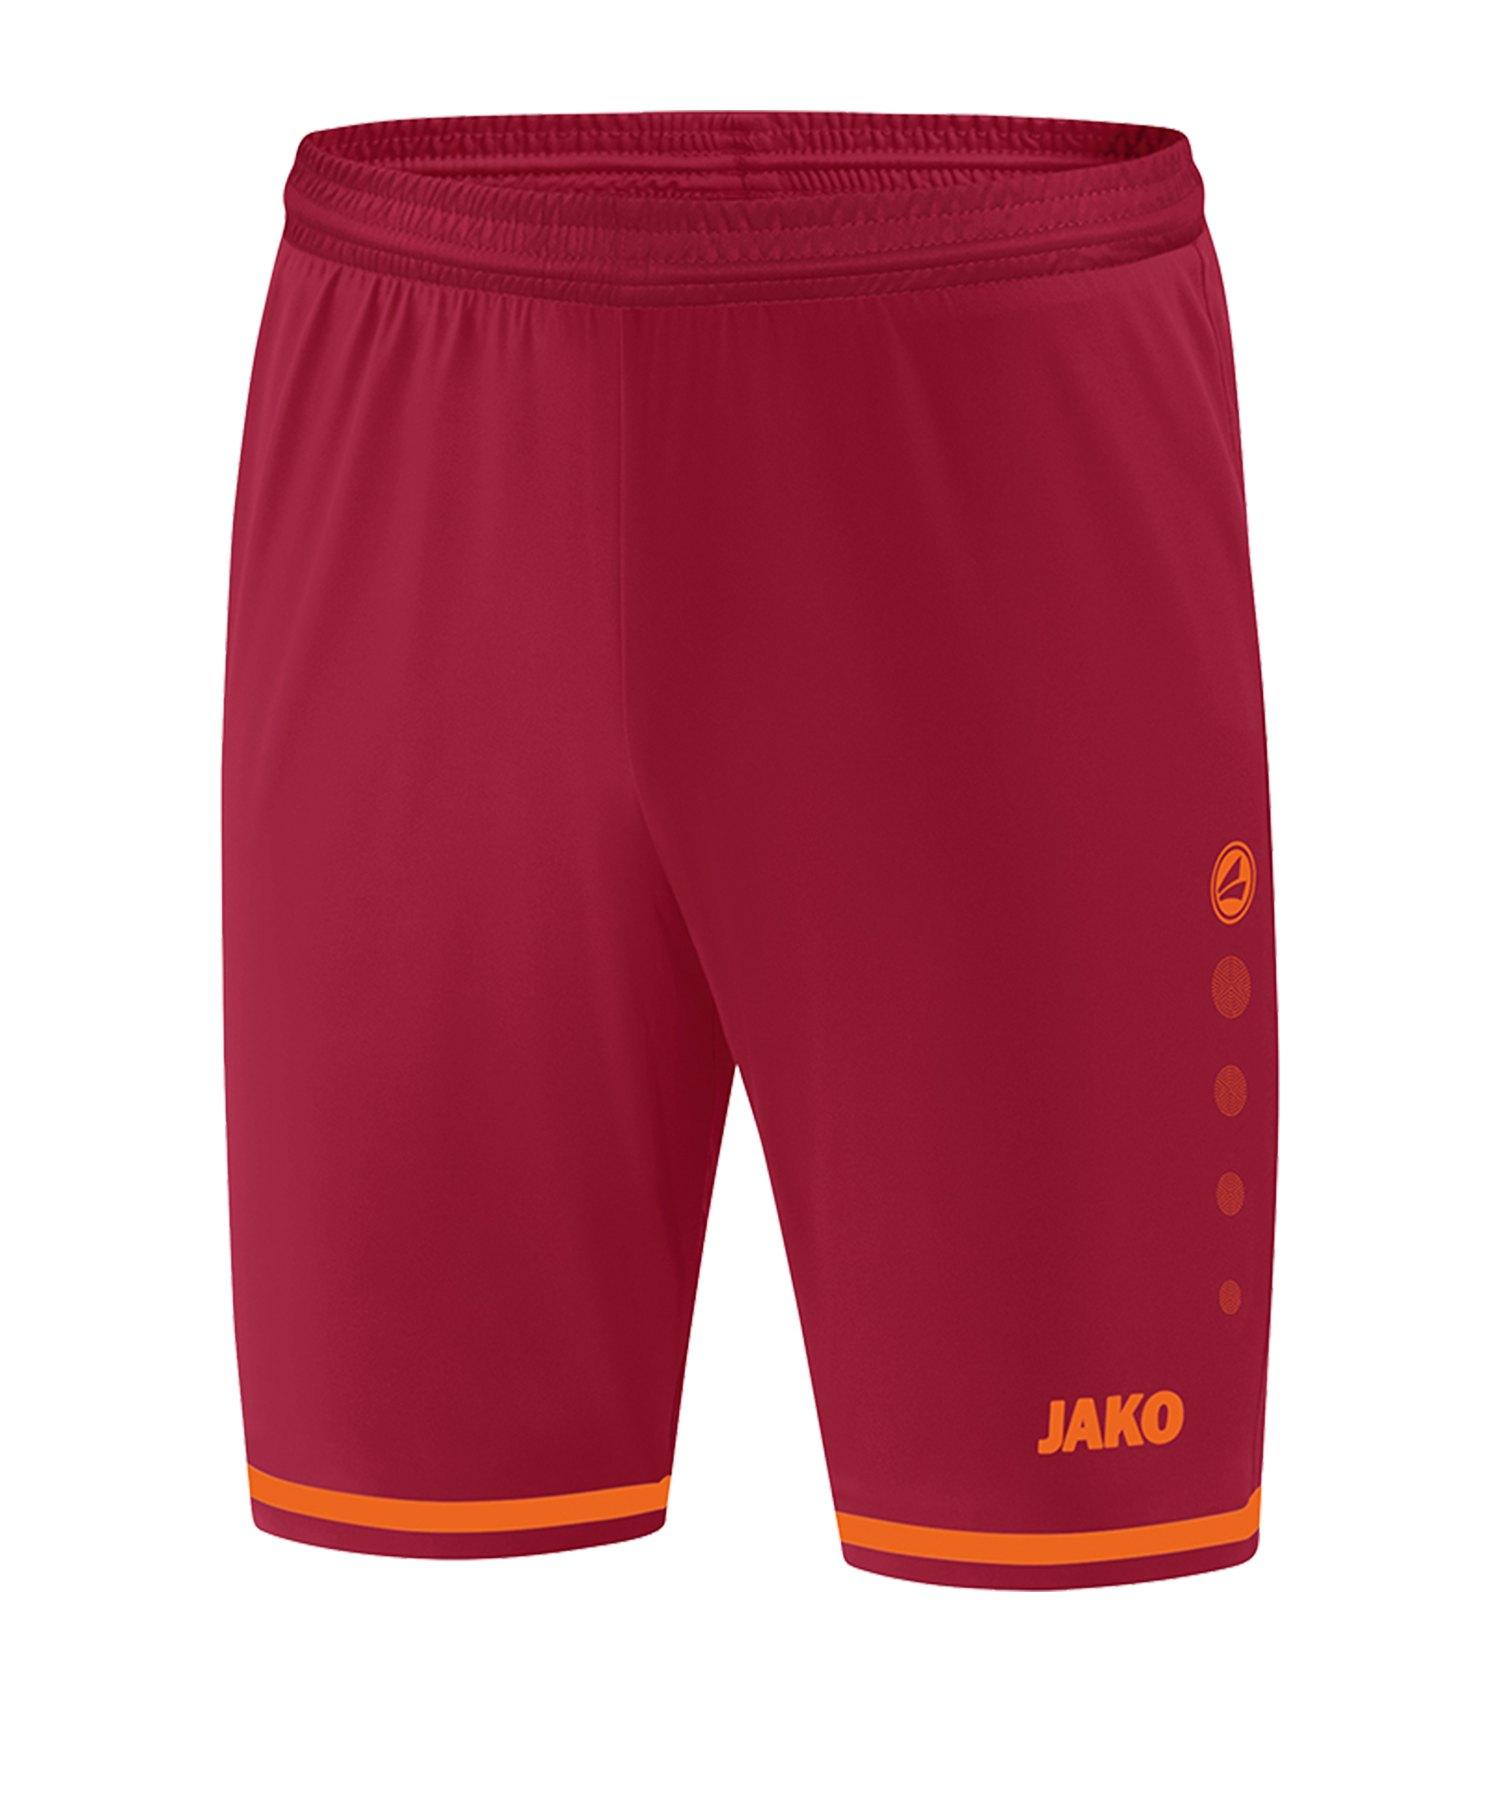 Jako Striker 2.0 Short Hose kurz Rot Orange F13 - Rot